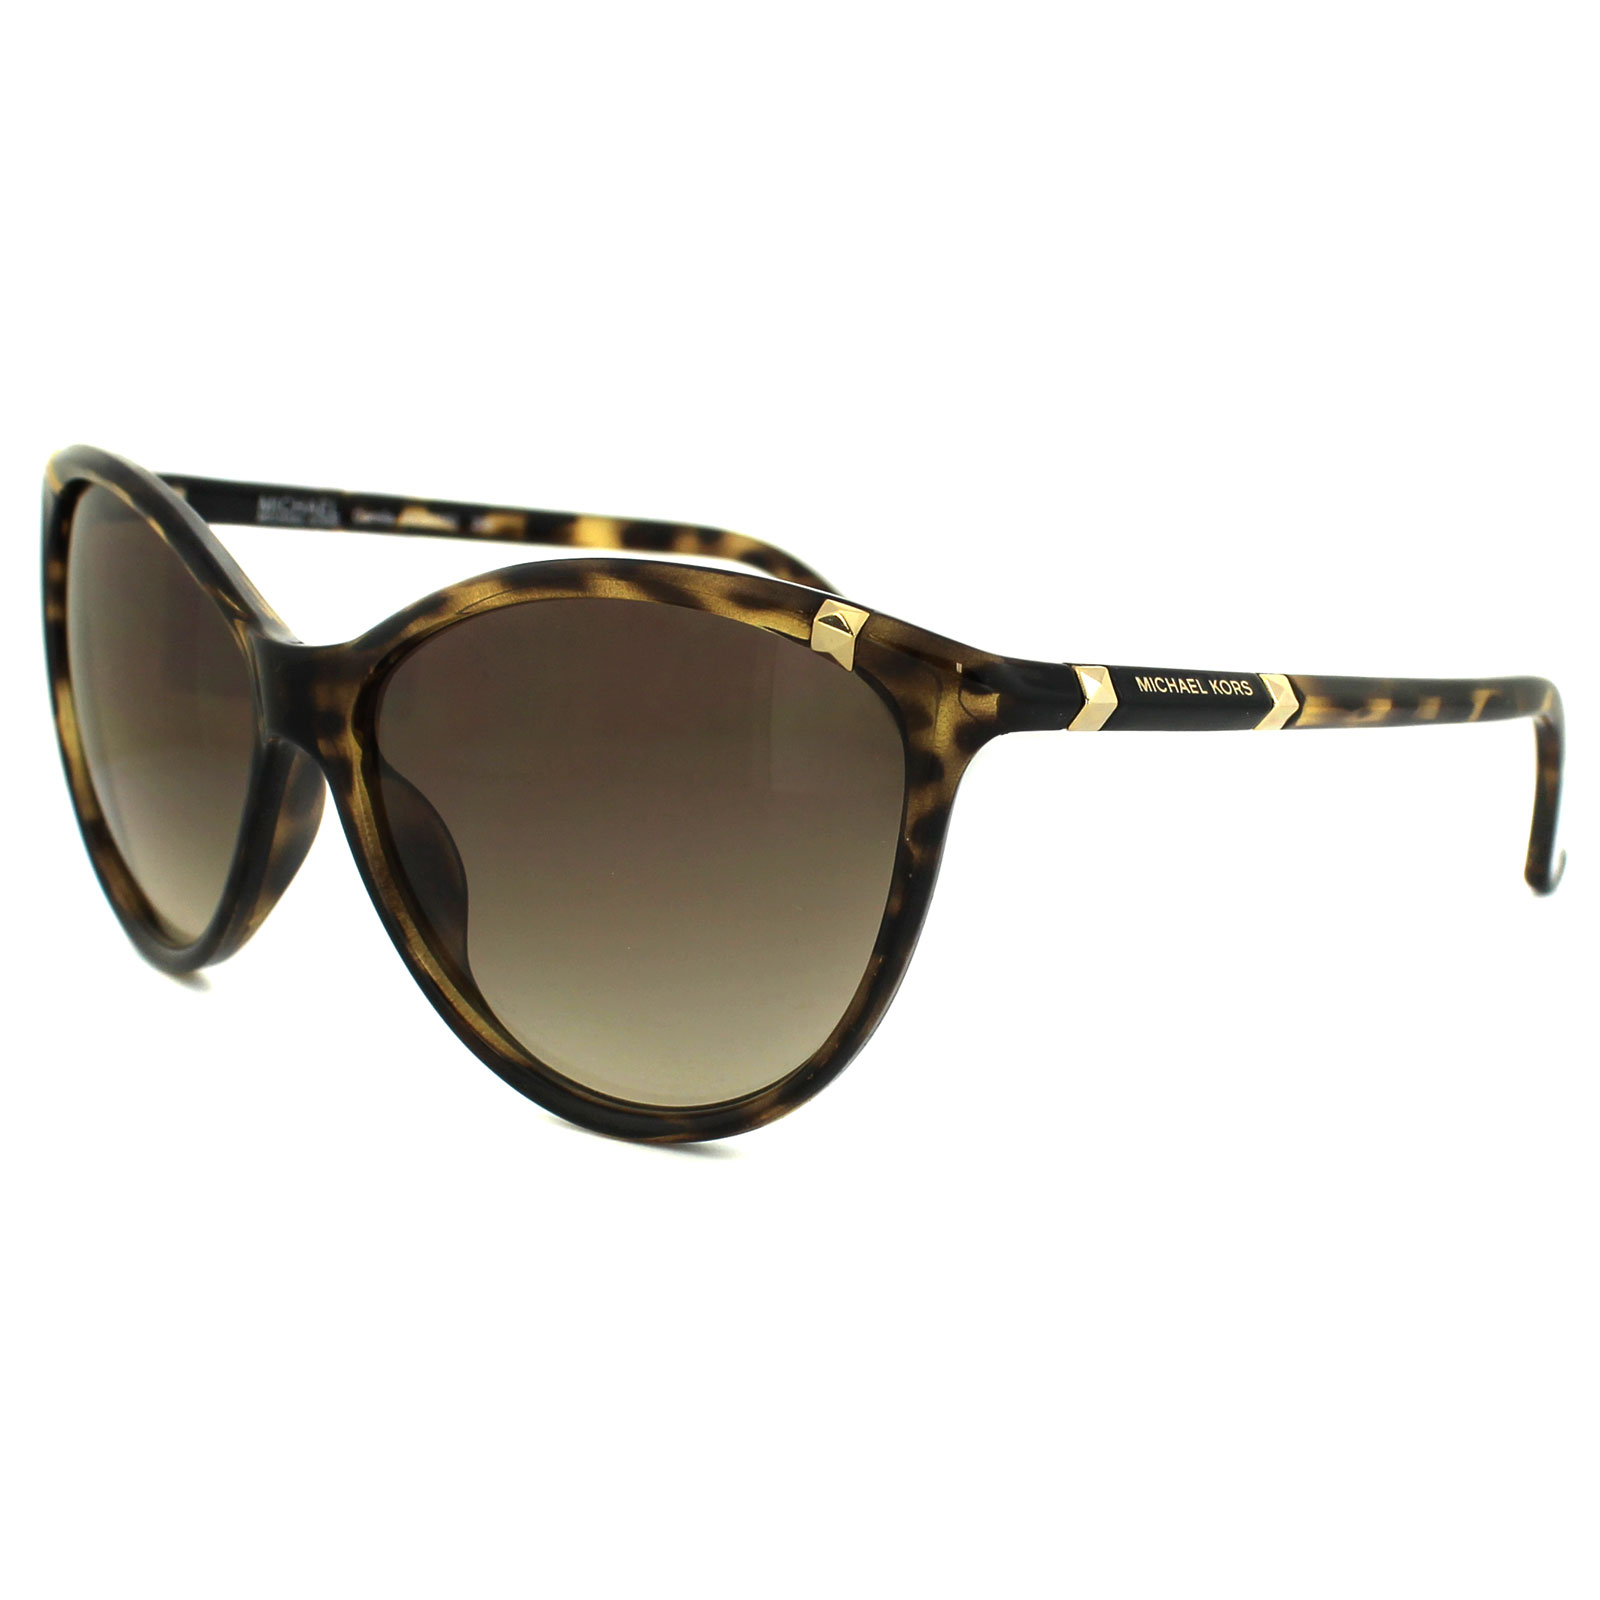 Michael Kors Camila Sunglasses  michael kors camila m2835s sunglasses ed sunglasses